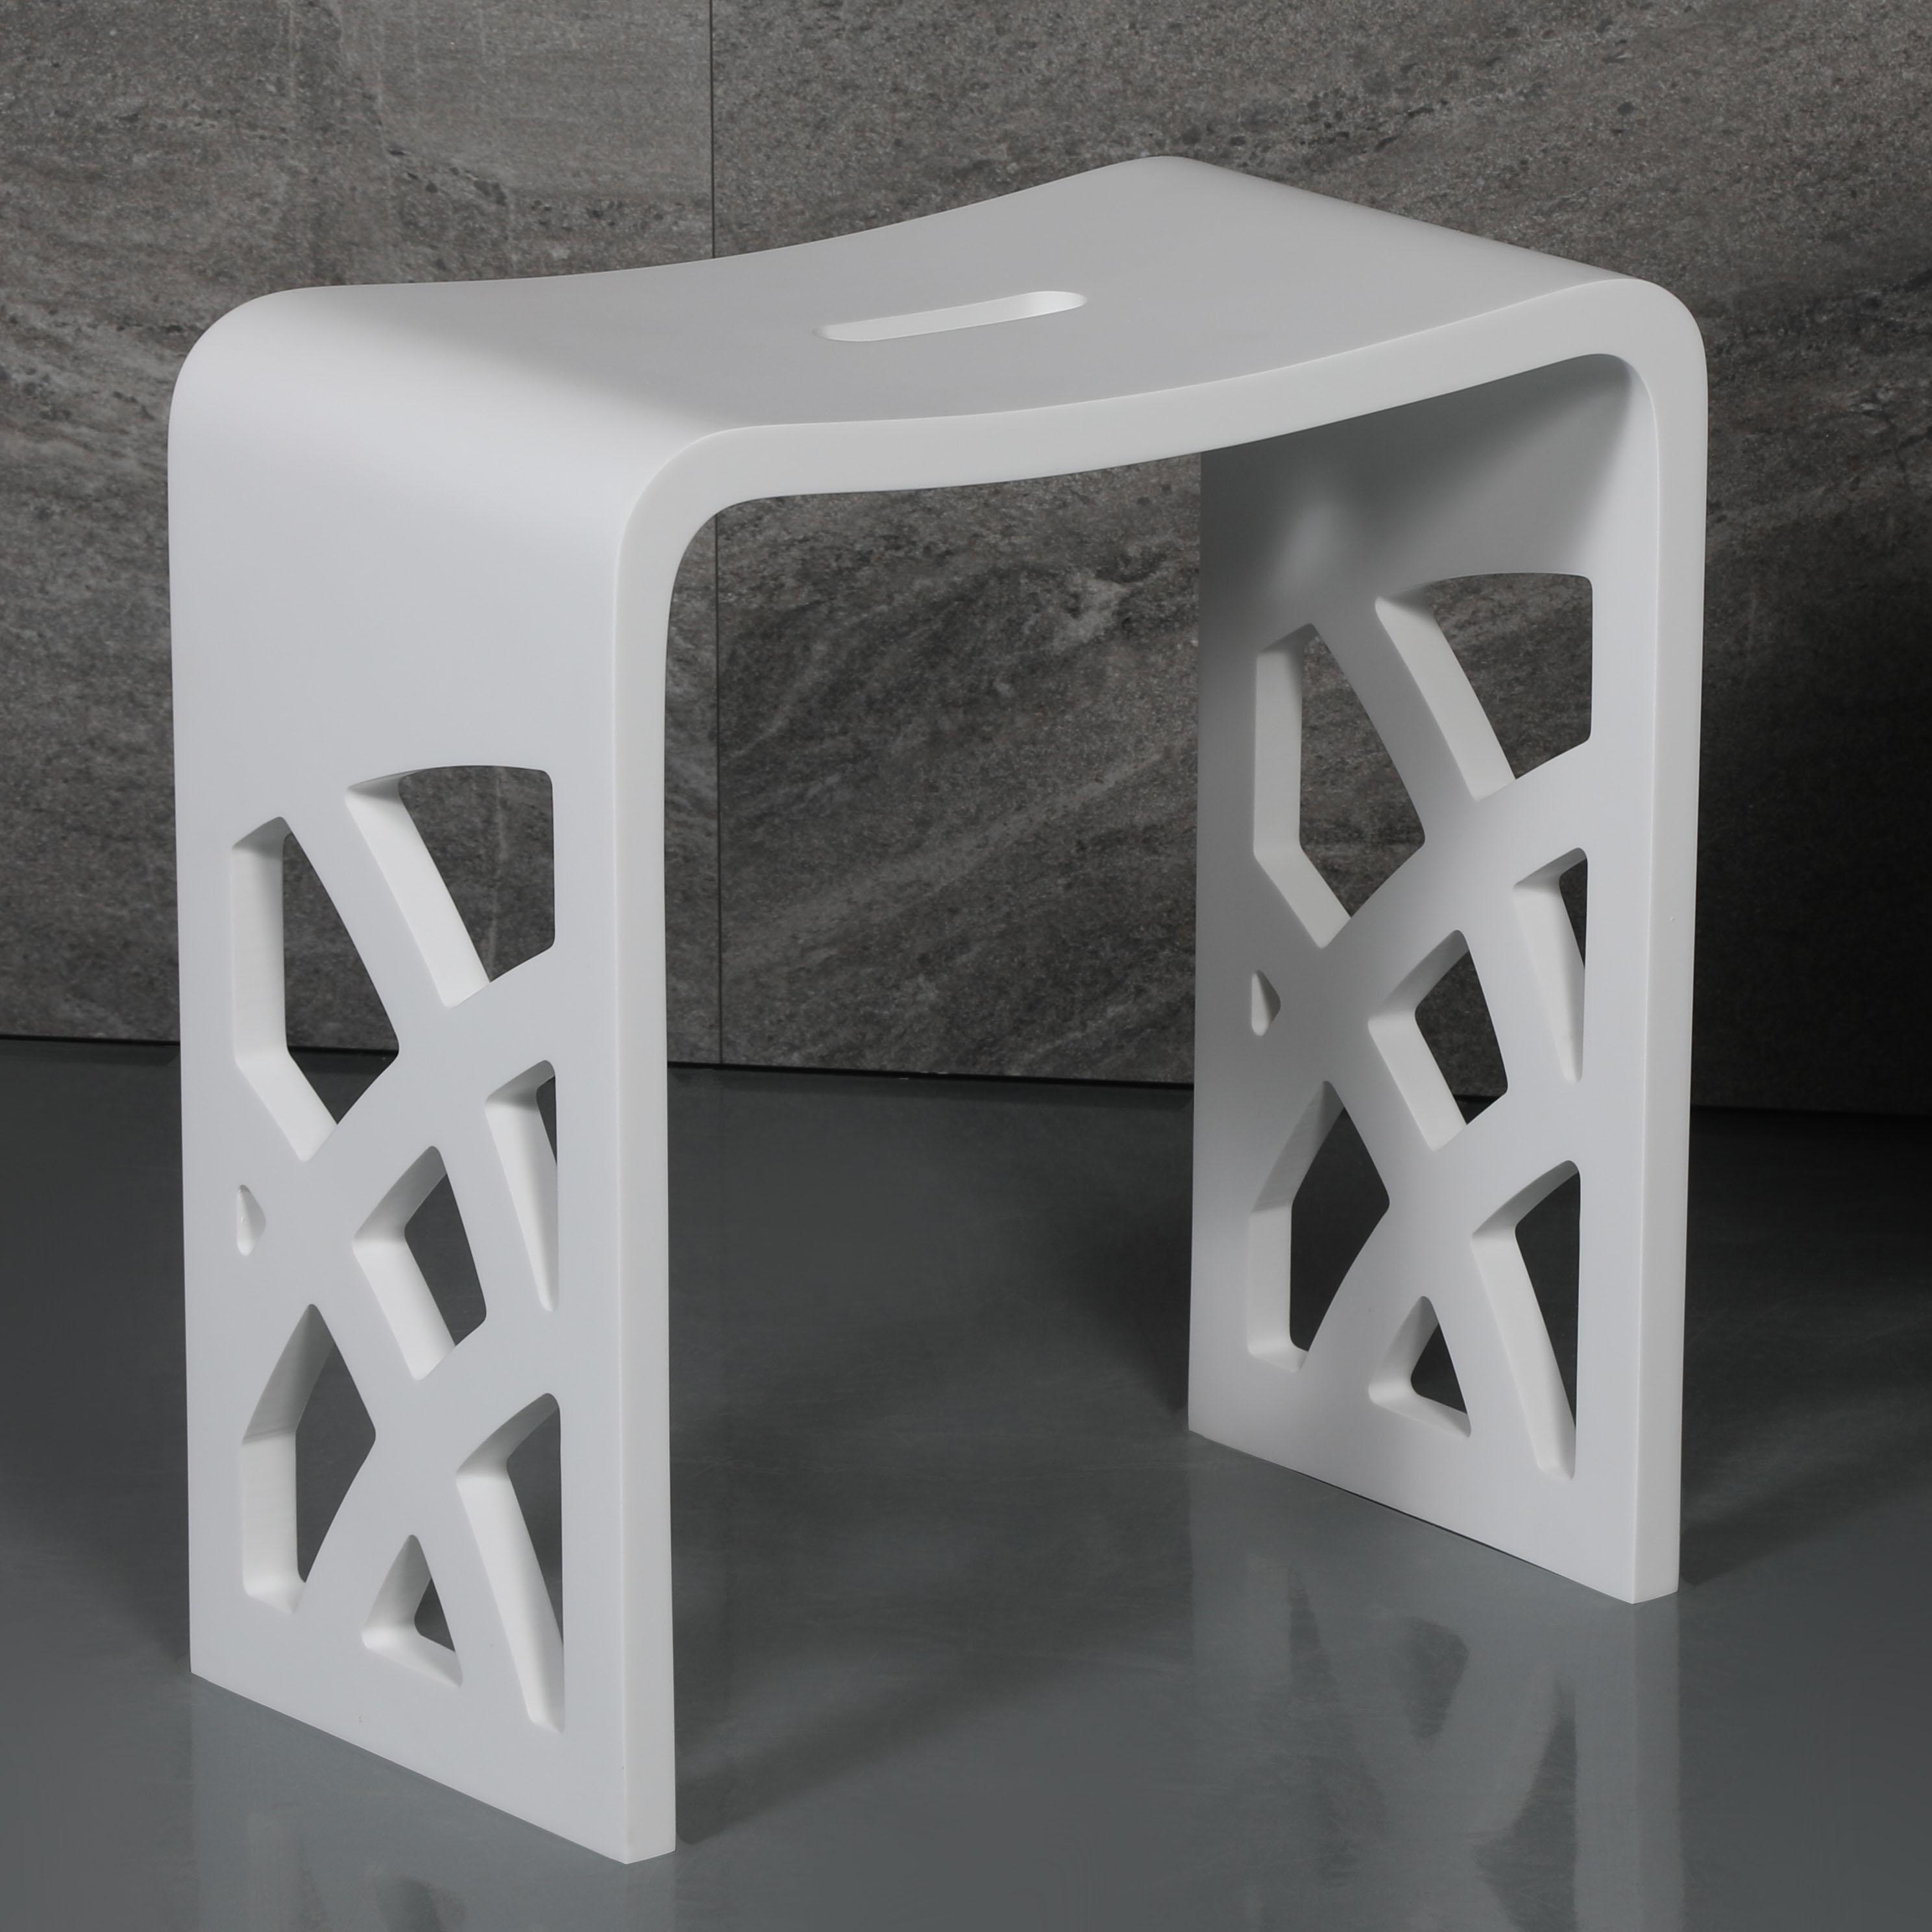 ALFI ABST88 Designer Solid Surface Resin Bathroom & Shower Stool, White Matte